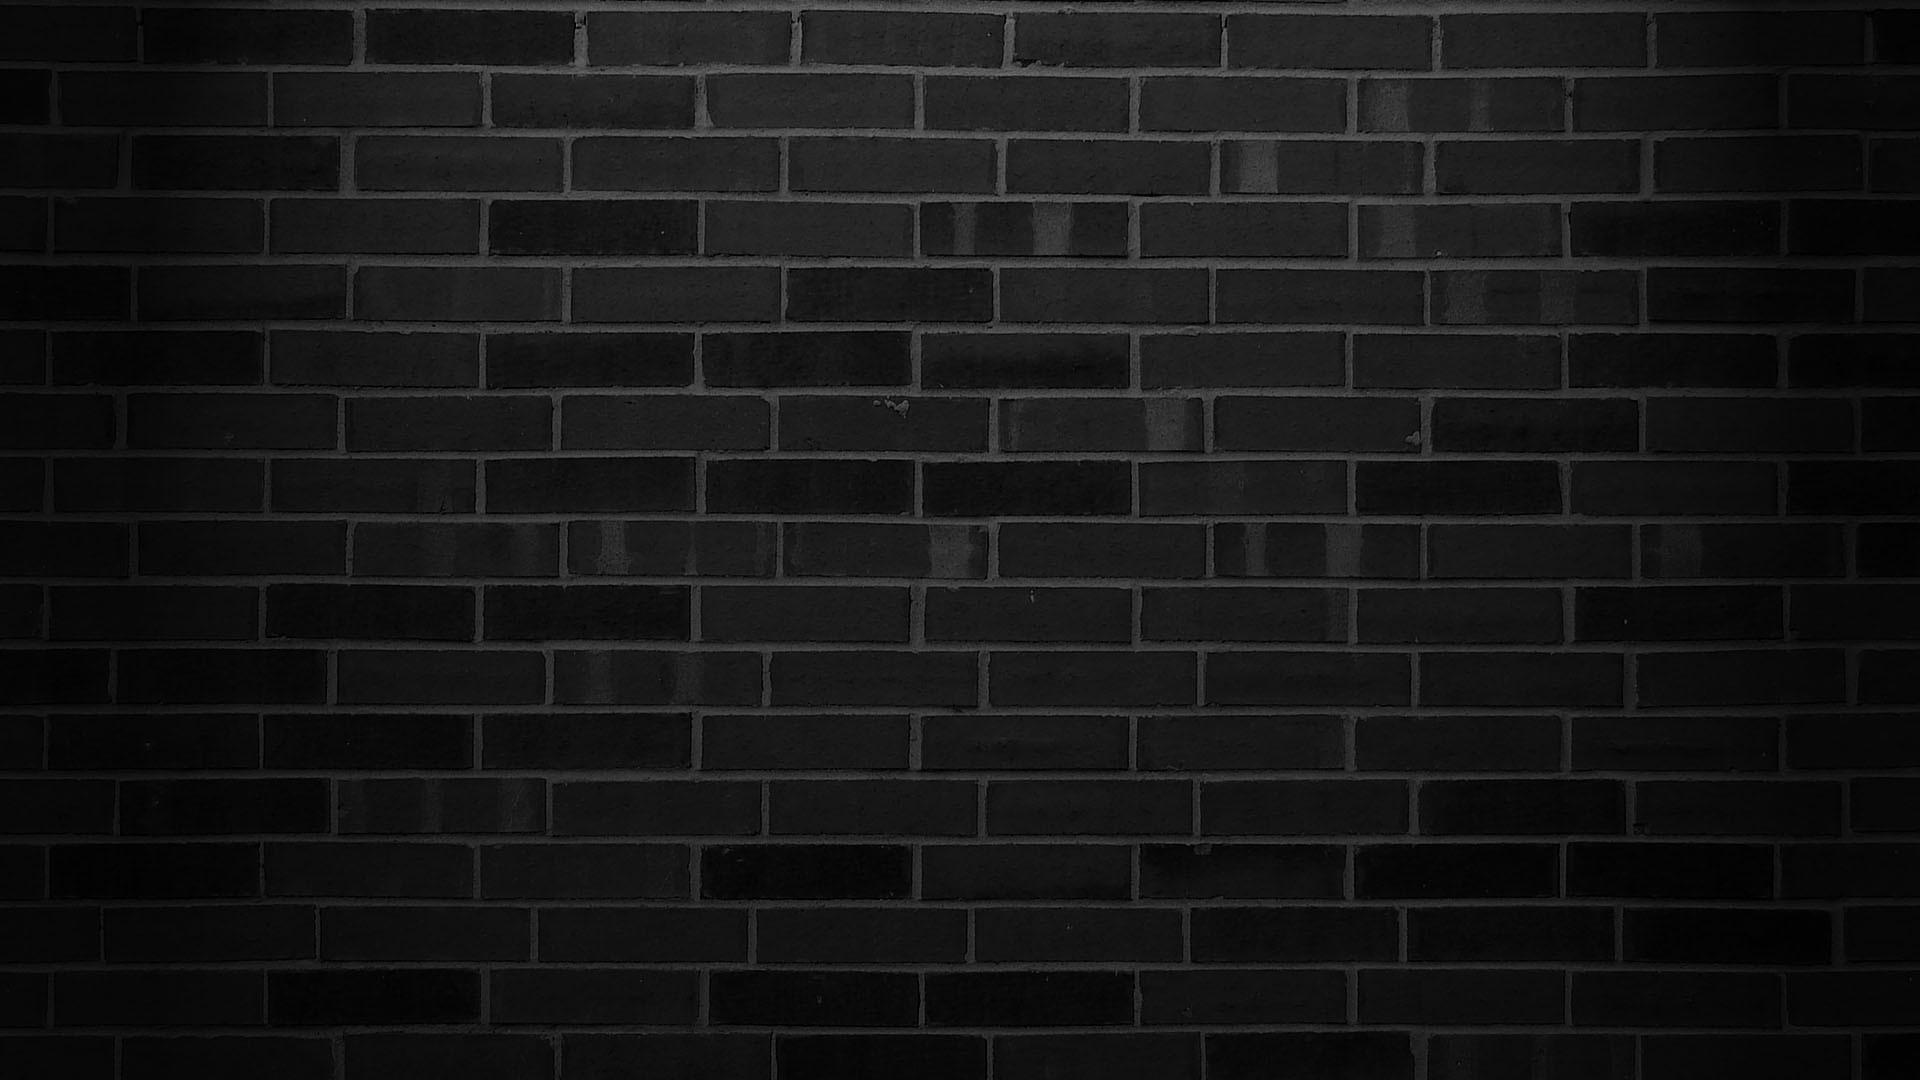 Fondos De Pantalla : Negro, Monocromo, Minimalismo, Pared